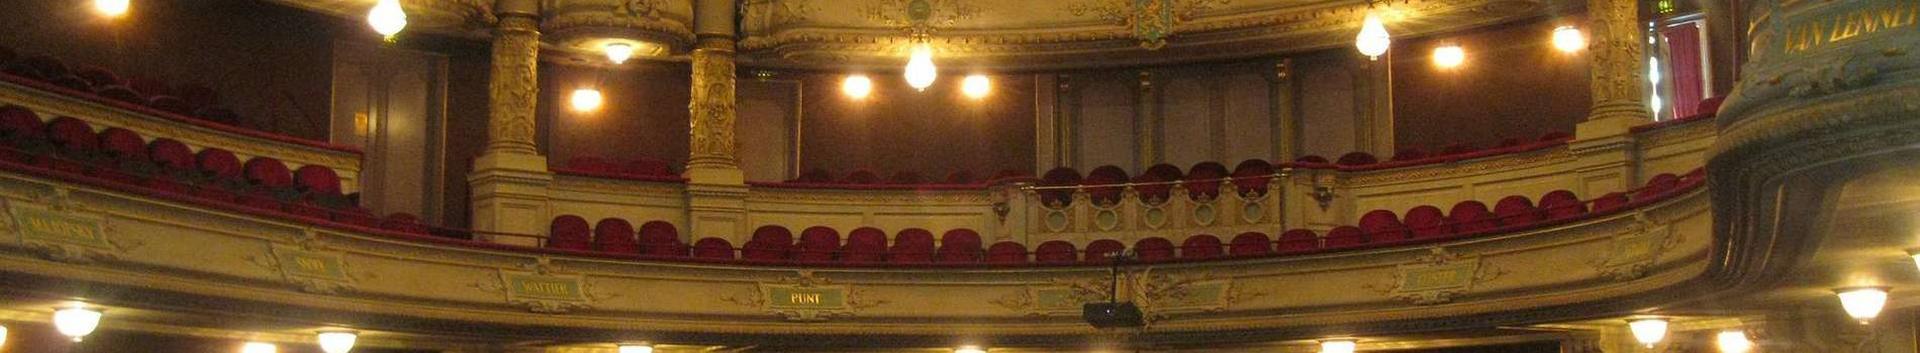 90041_teatri-jms-hoonete-kaitus_68659658_xl.jpg